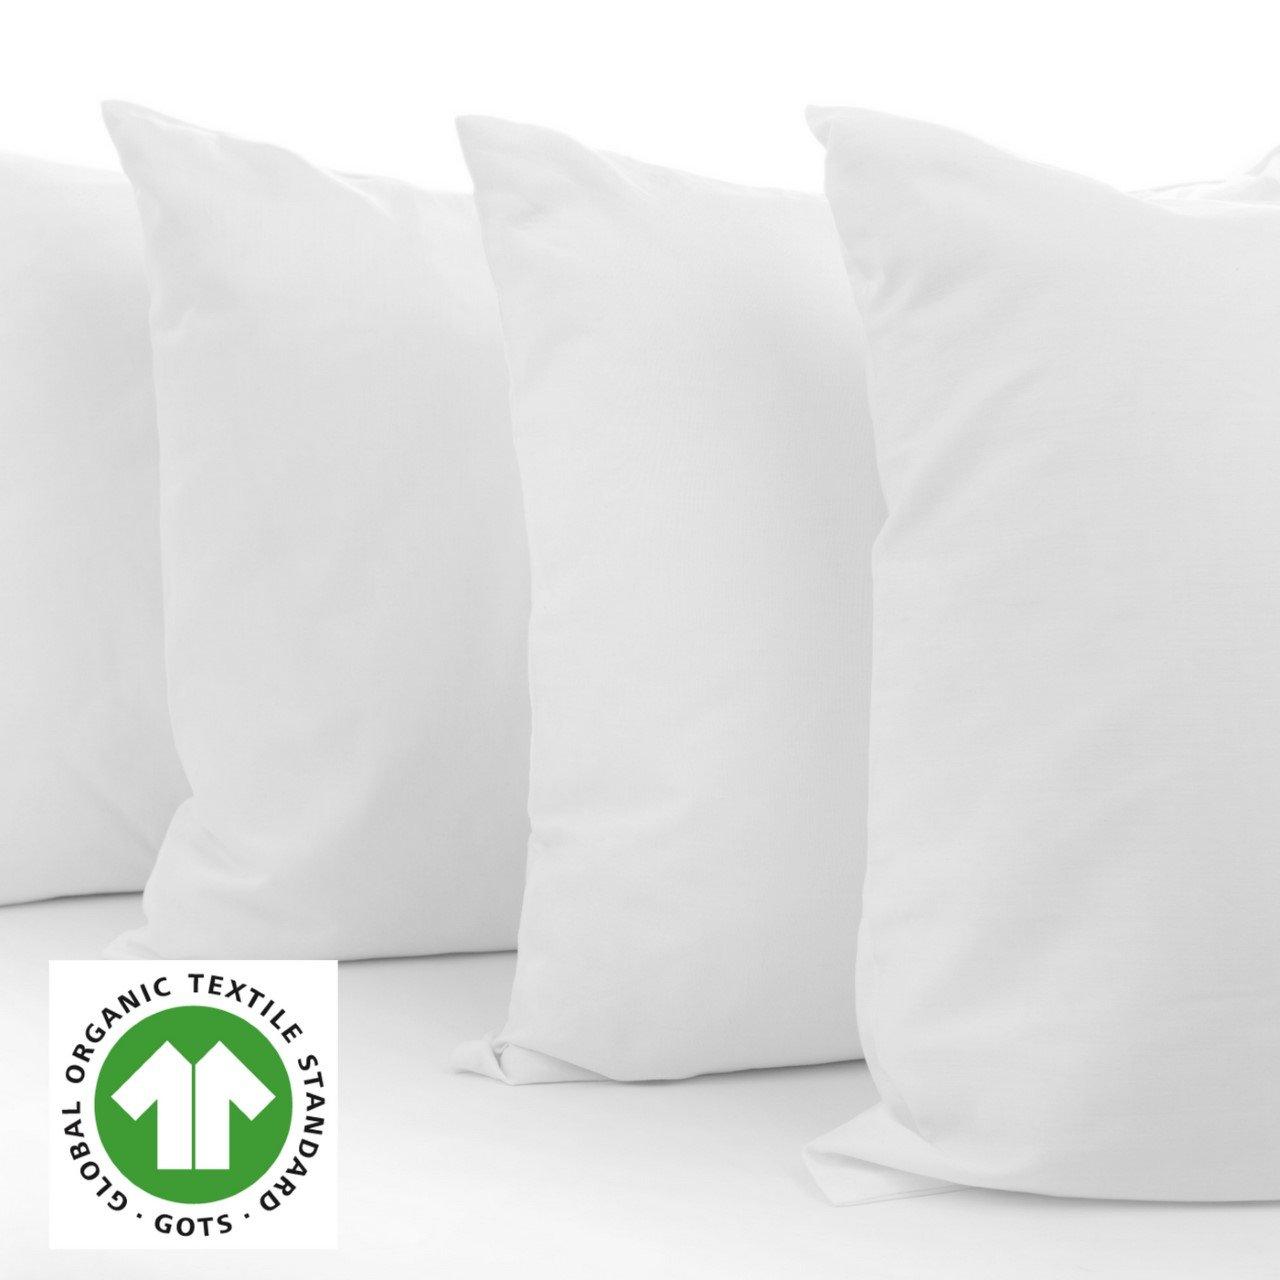 A1HC Organic Cotton Sterilized 95% feather 5% Down Pillow Insert 24 x 24'' White Set of 2